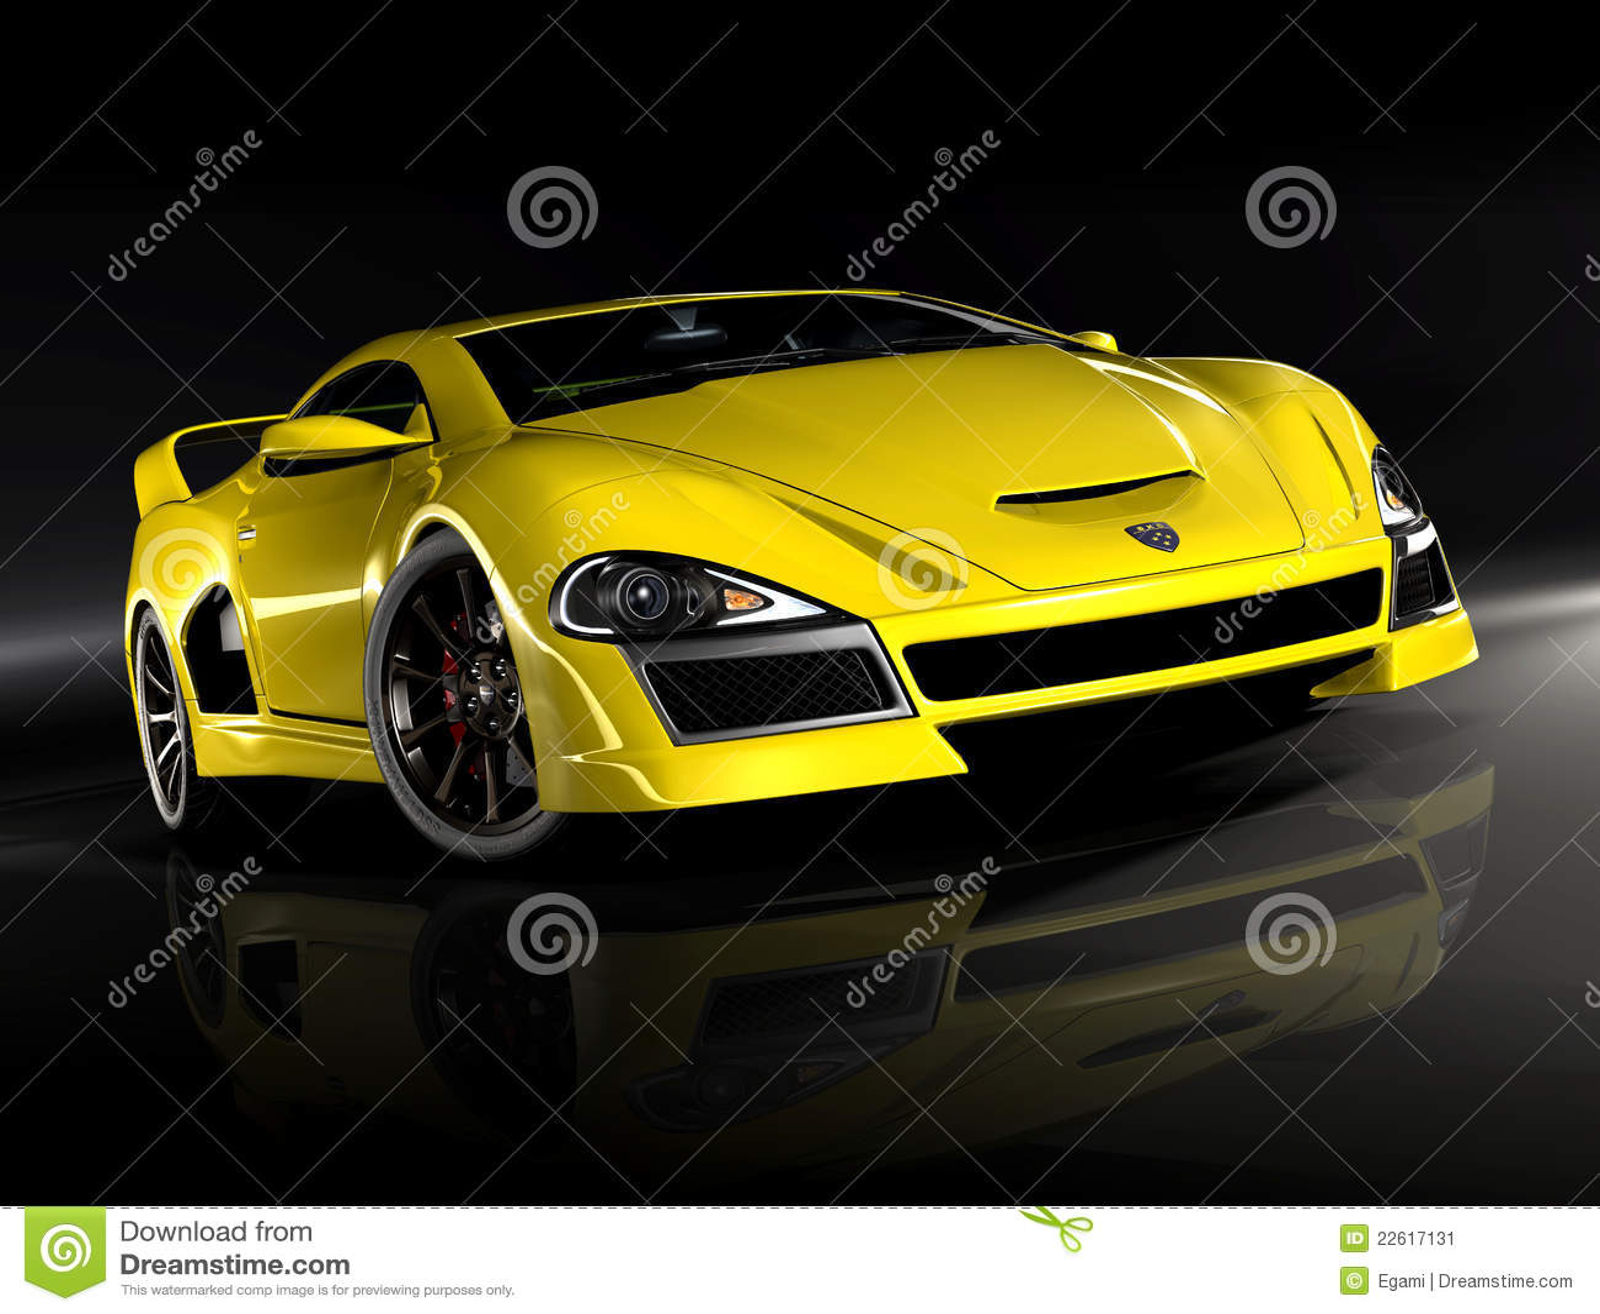 Hyper Car Yellow 2 Stock Image